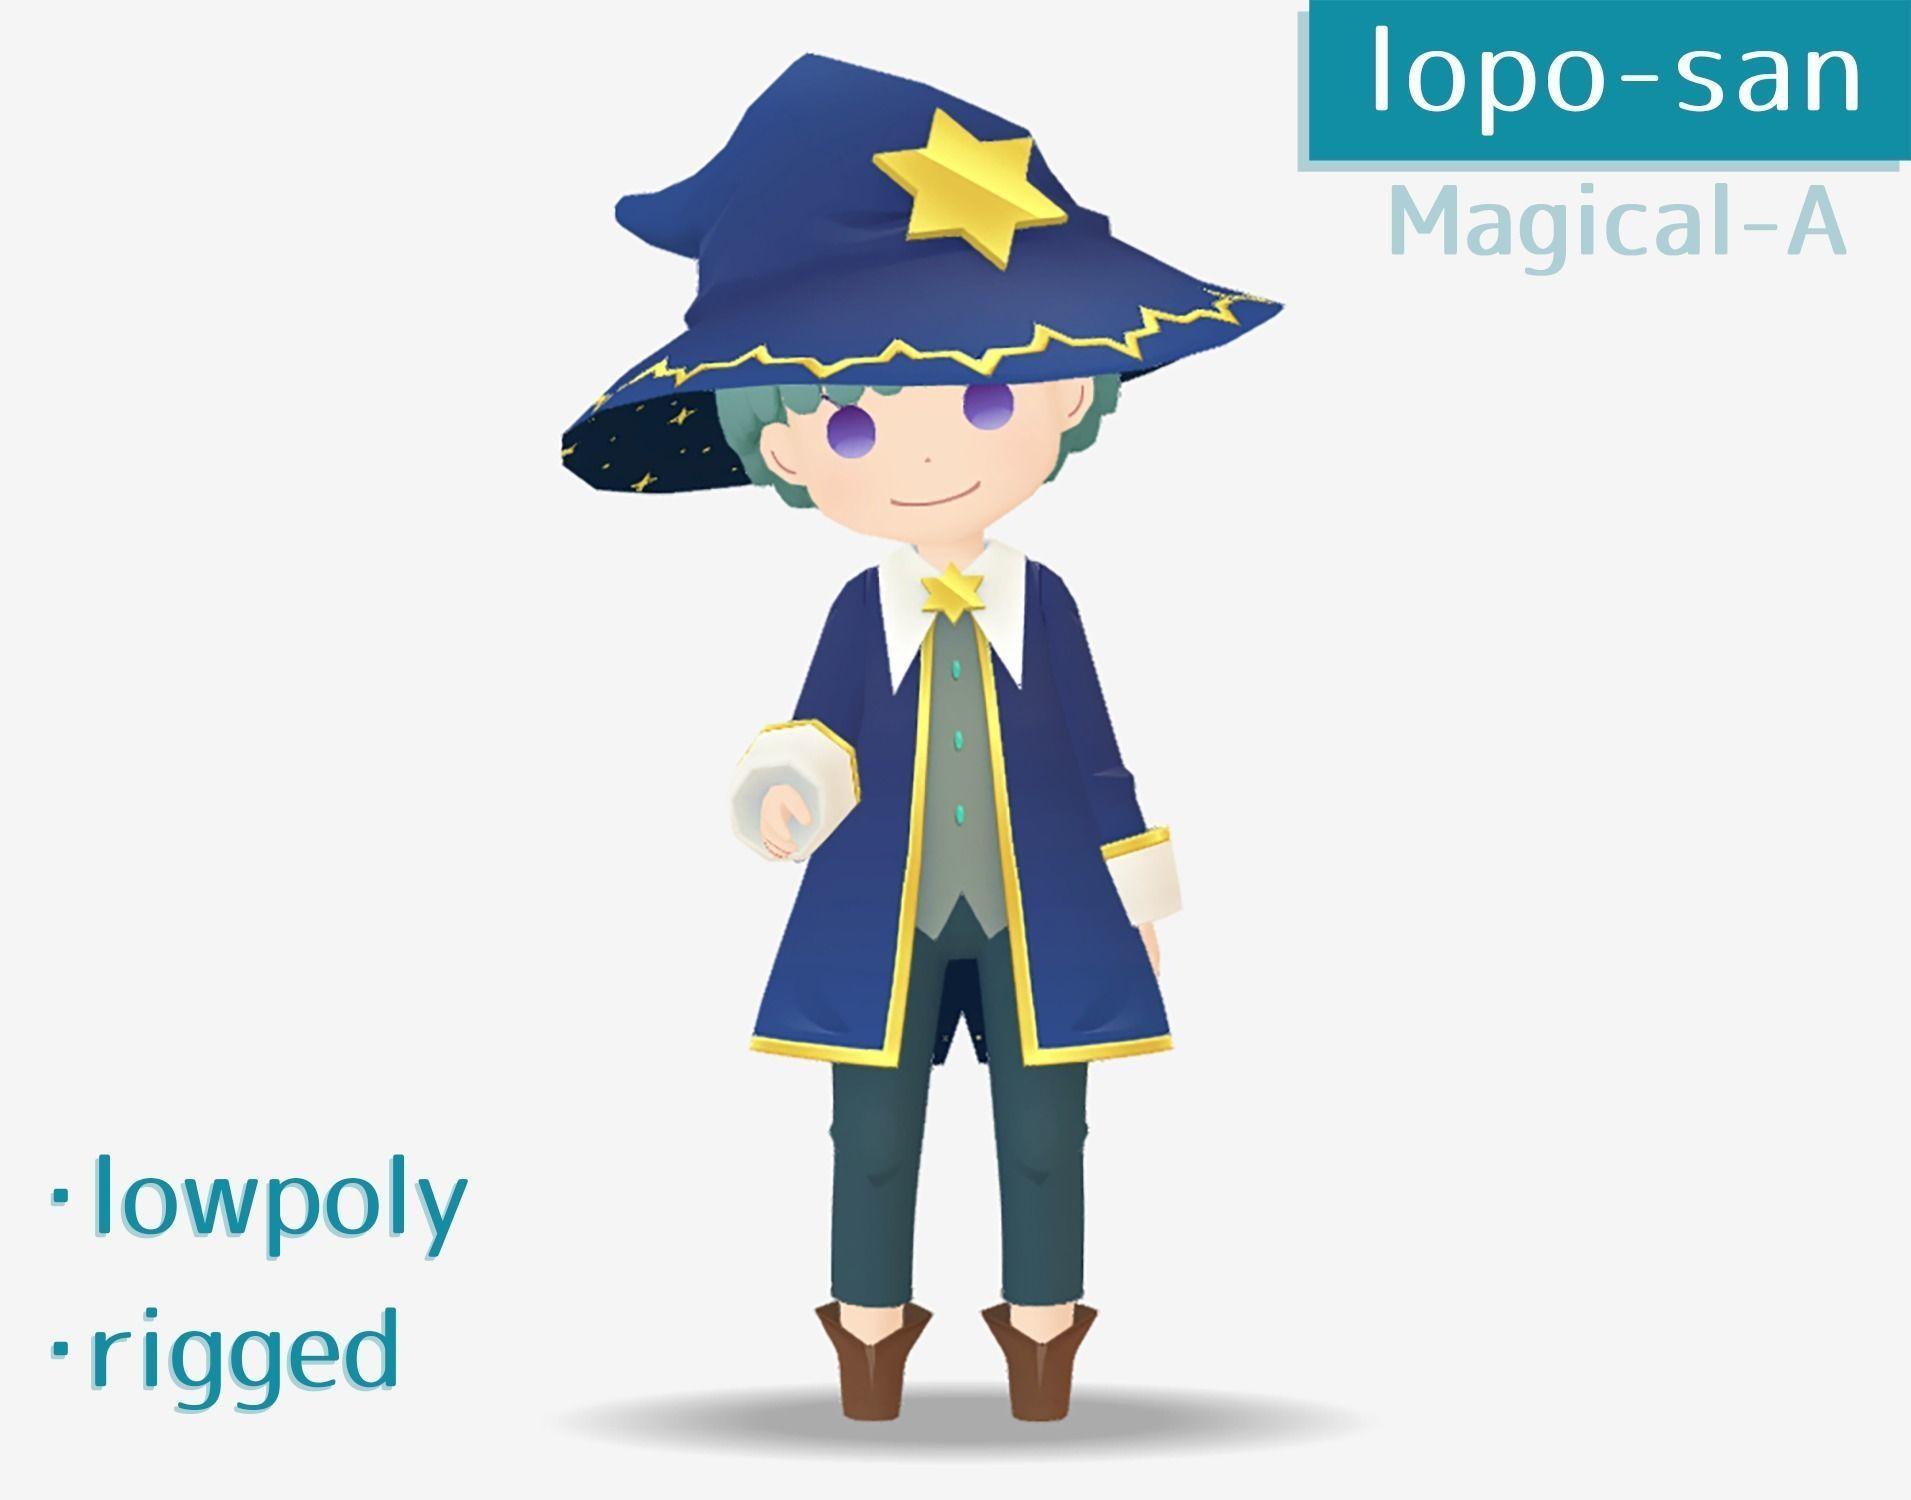 lopo-san Magical-A